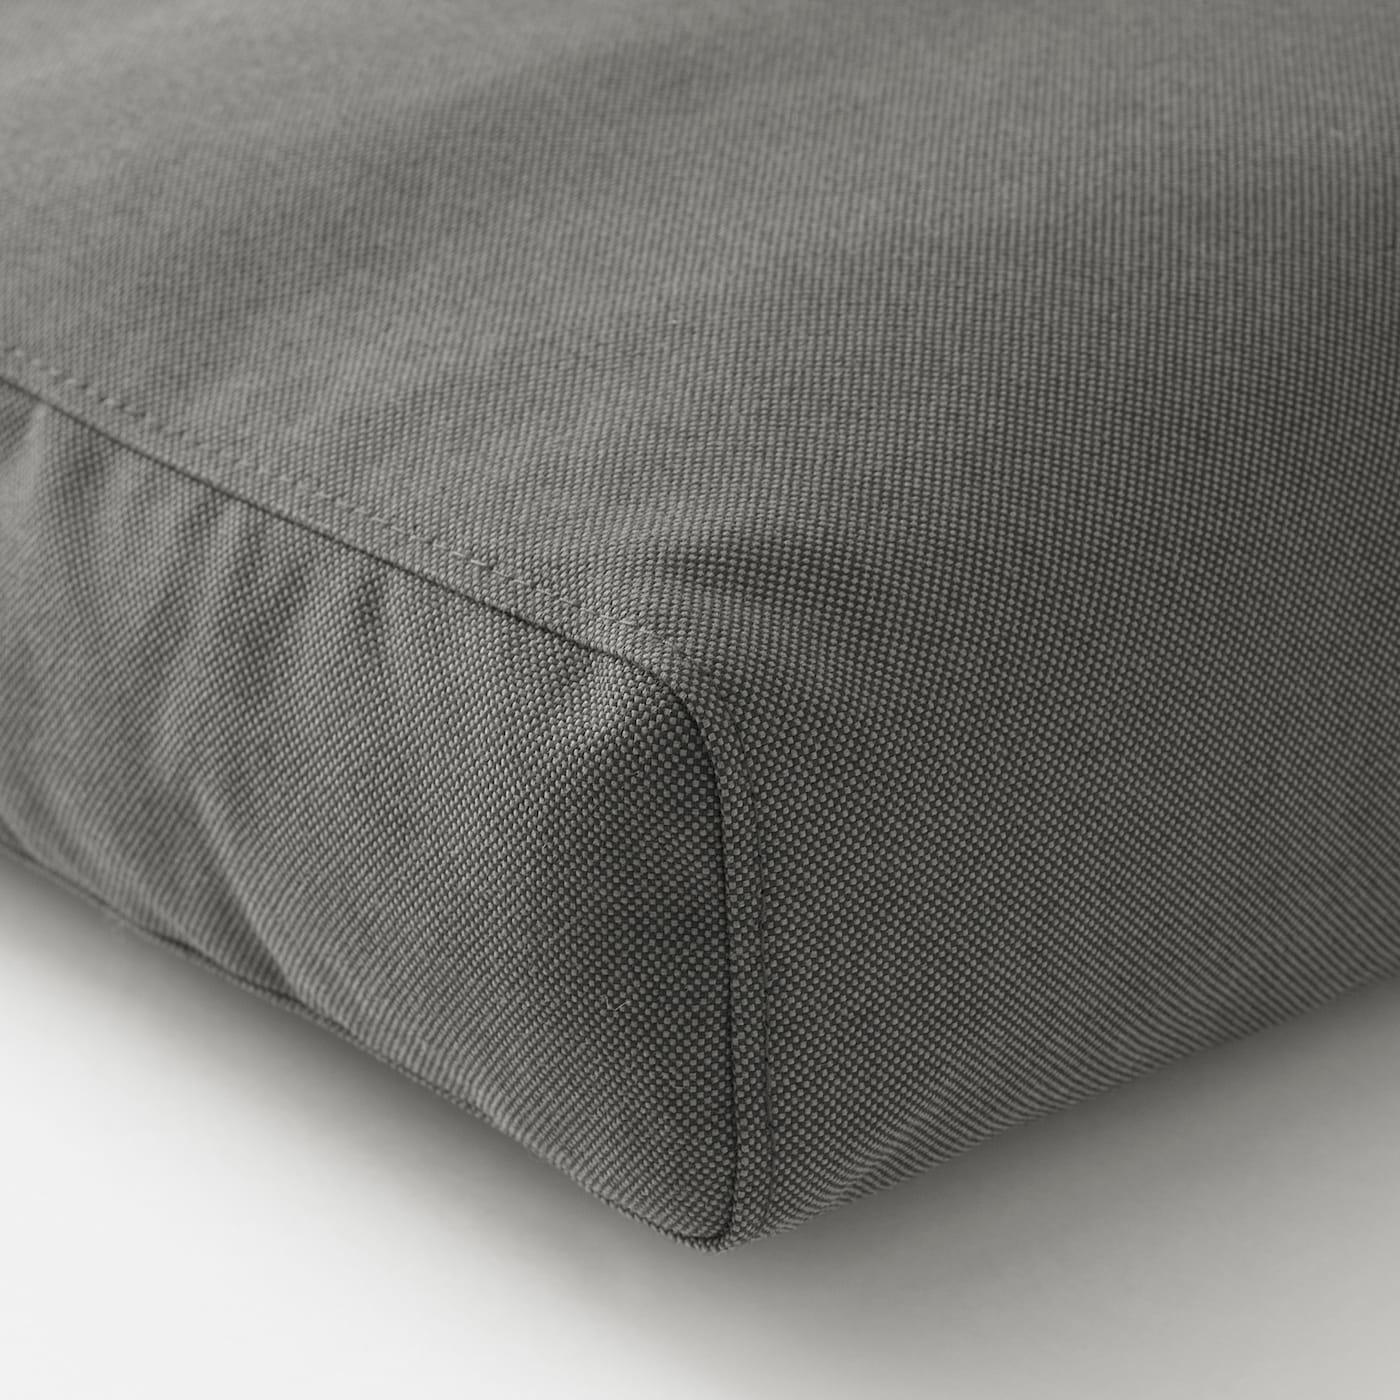 FRÖSÖN/DUVHOLMEN وسادة ظهر، خارجية, رمادي غامق, 62x44 سم